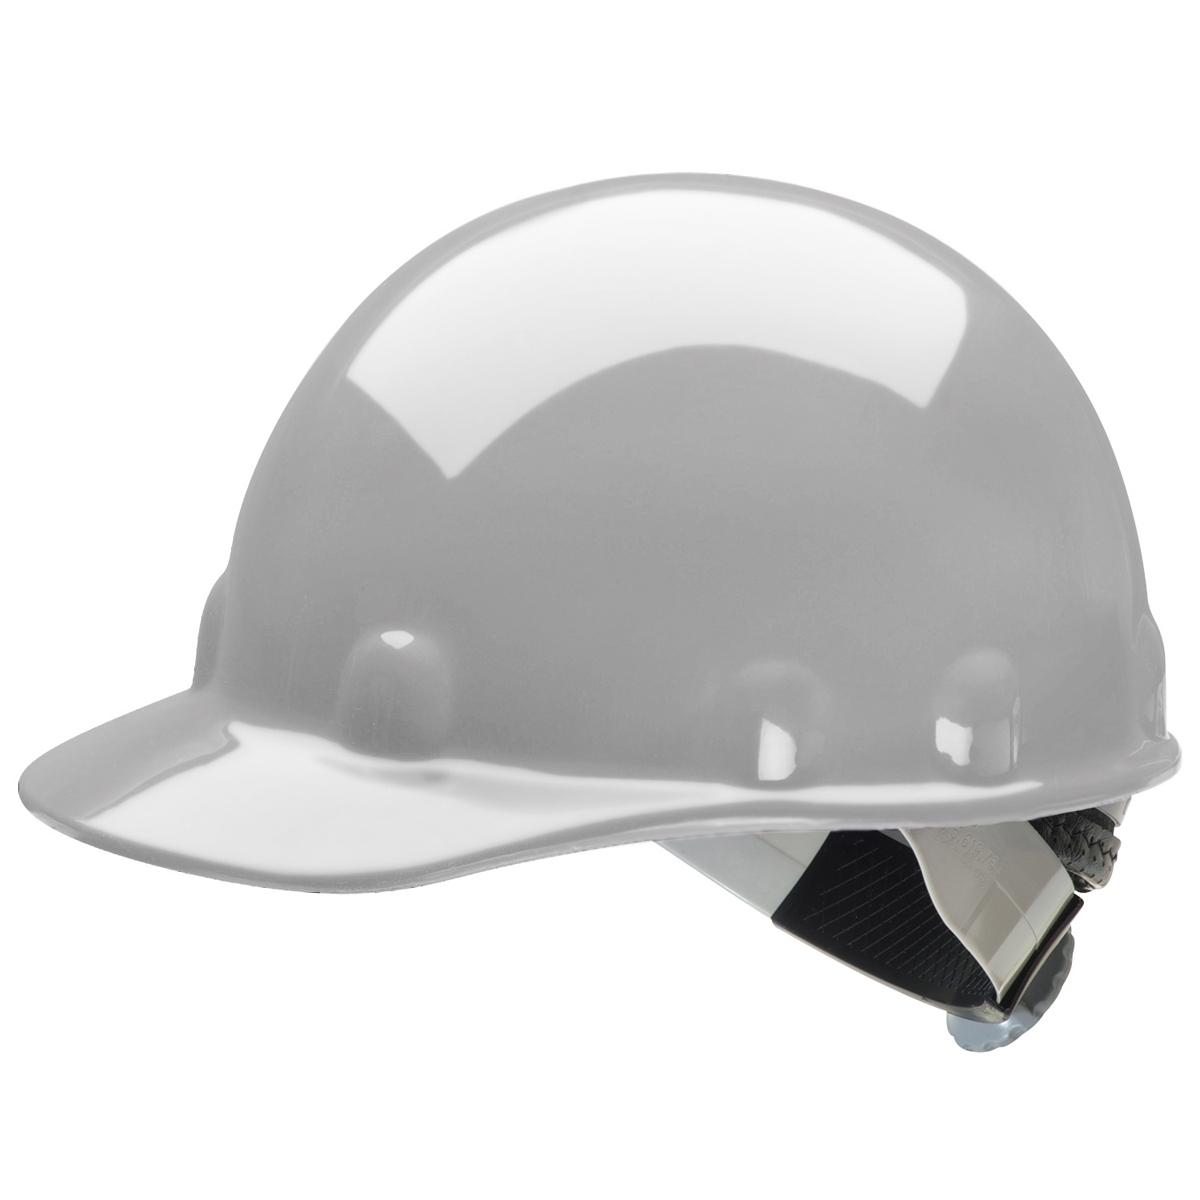 Fibre metal e2sw hard hat swingstrap suspension gray for Suspension metal